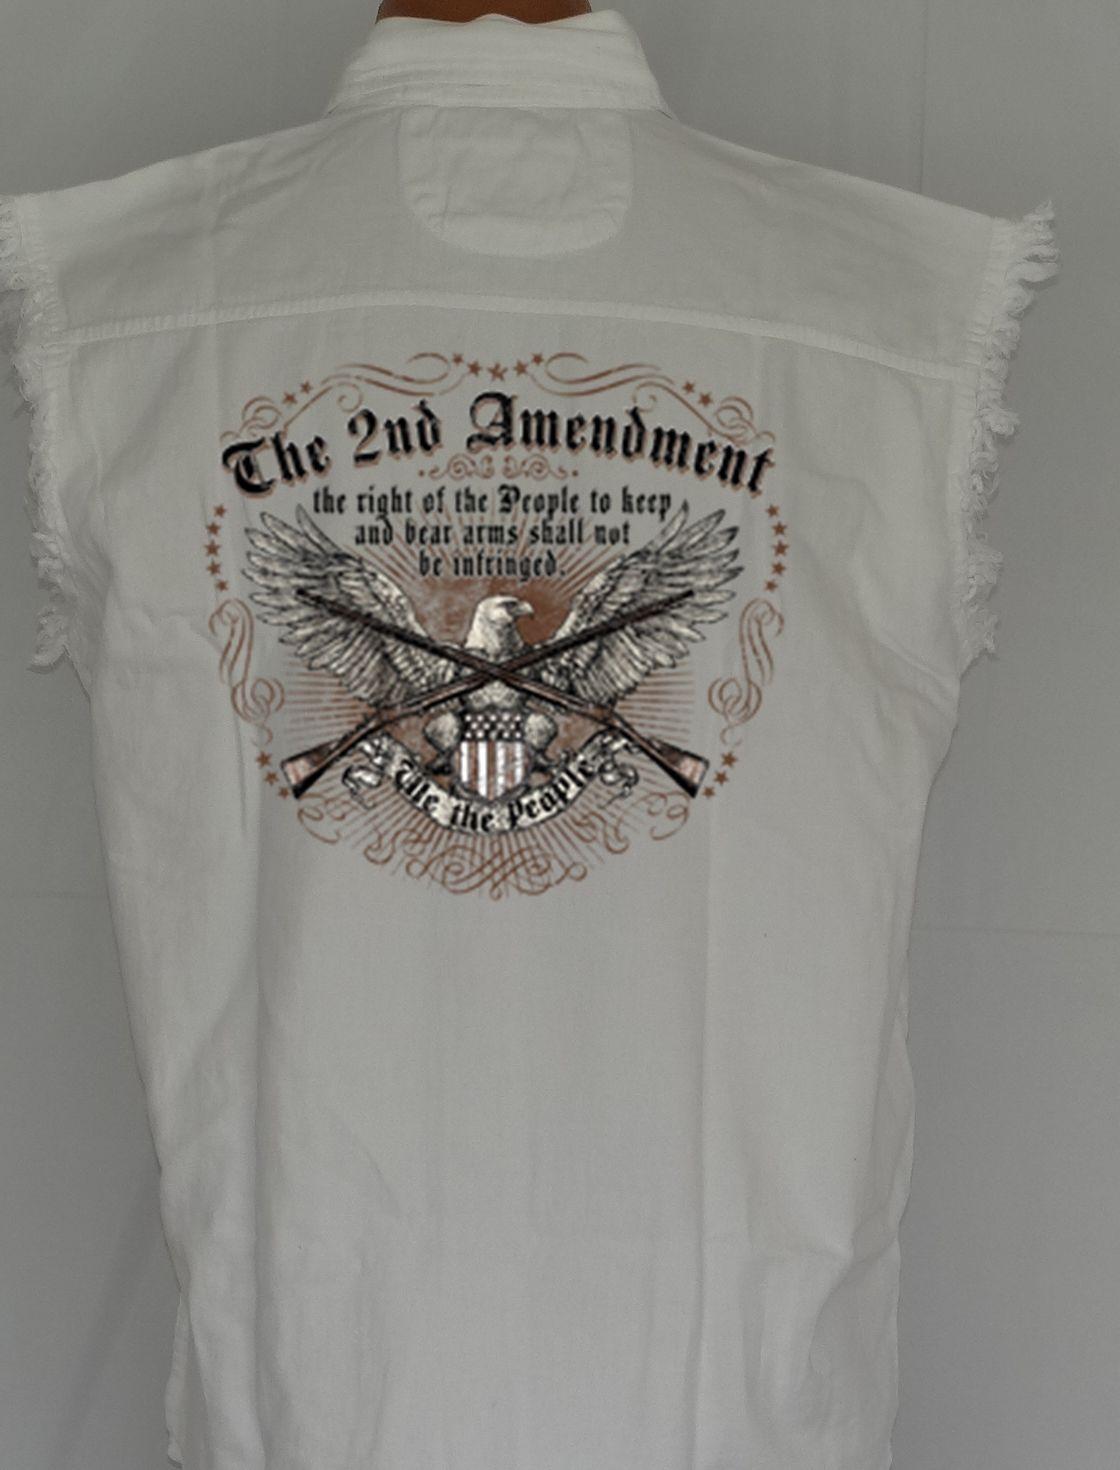 MEN-039-S-BIKER-SLEEVELESS-DENIM-SHIRT-The-2nd-Amendment-EAGLE-GUNS-M-XL-2X-3X-4X-5X